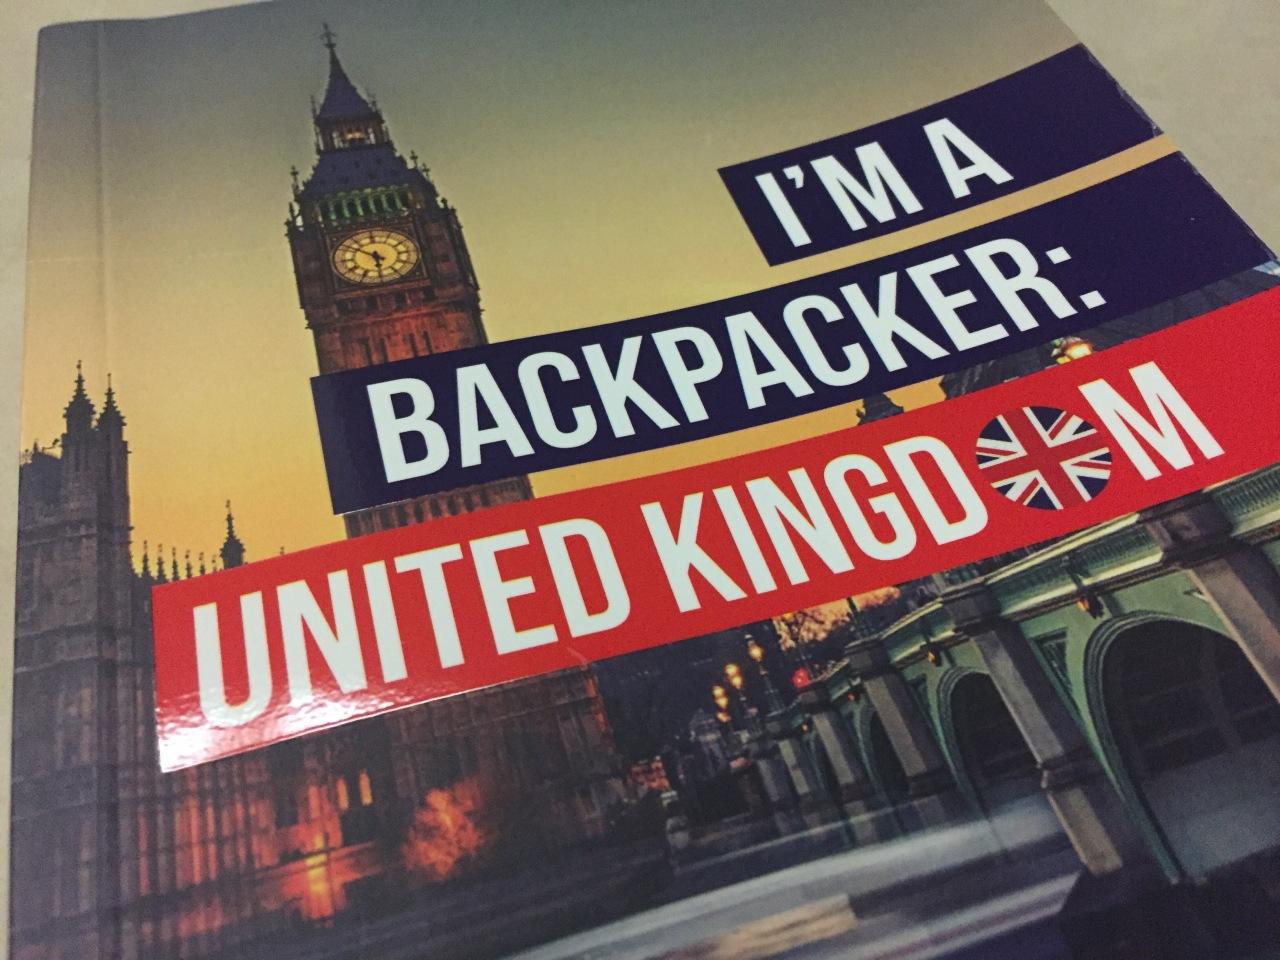 Book Review – I'm A Backpacker: UnitedKingdom